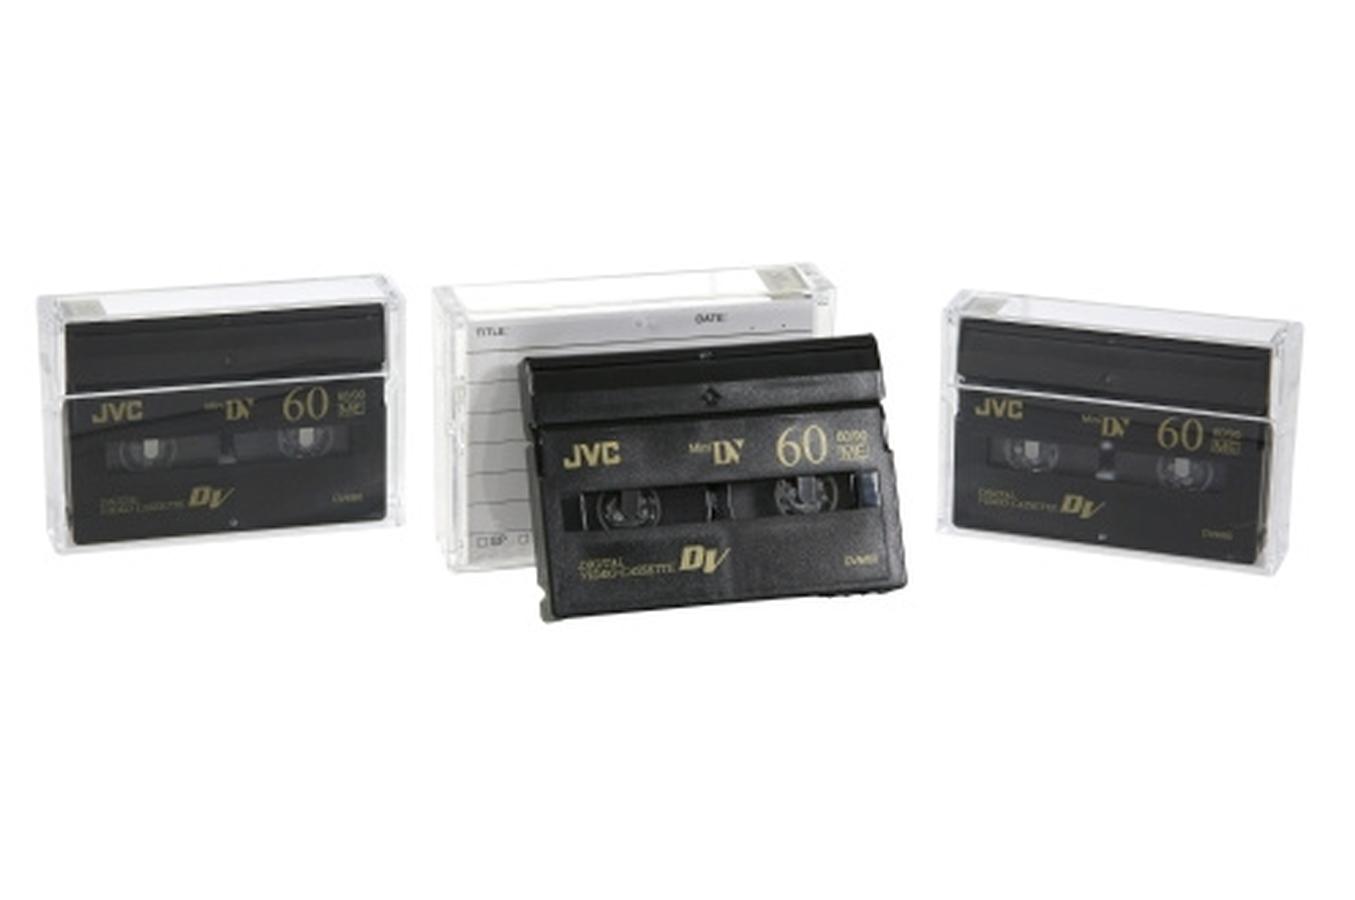 cassette cam scope jvc dv 60mn x3 mdv60de3 1196820 darty. Black Bedroom Furniture Sets. Home Design Ideas